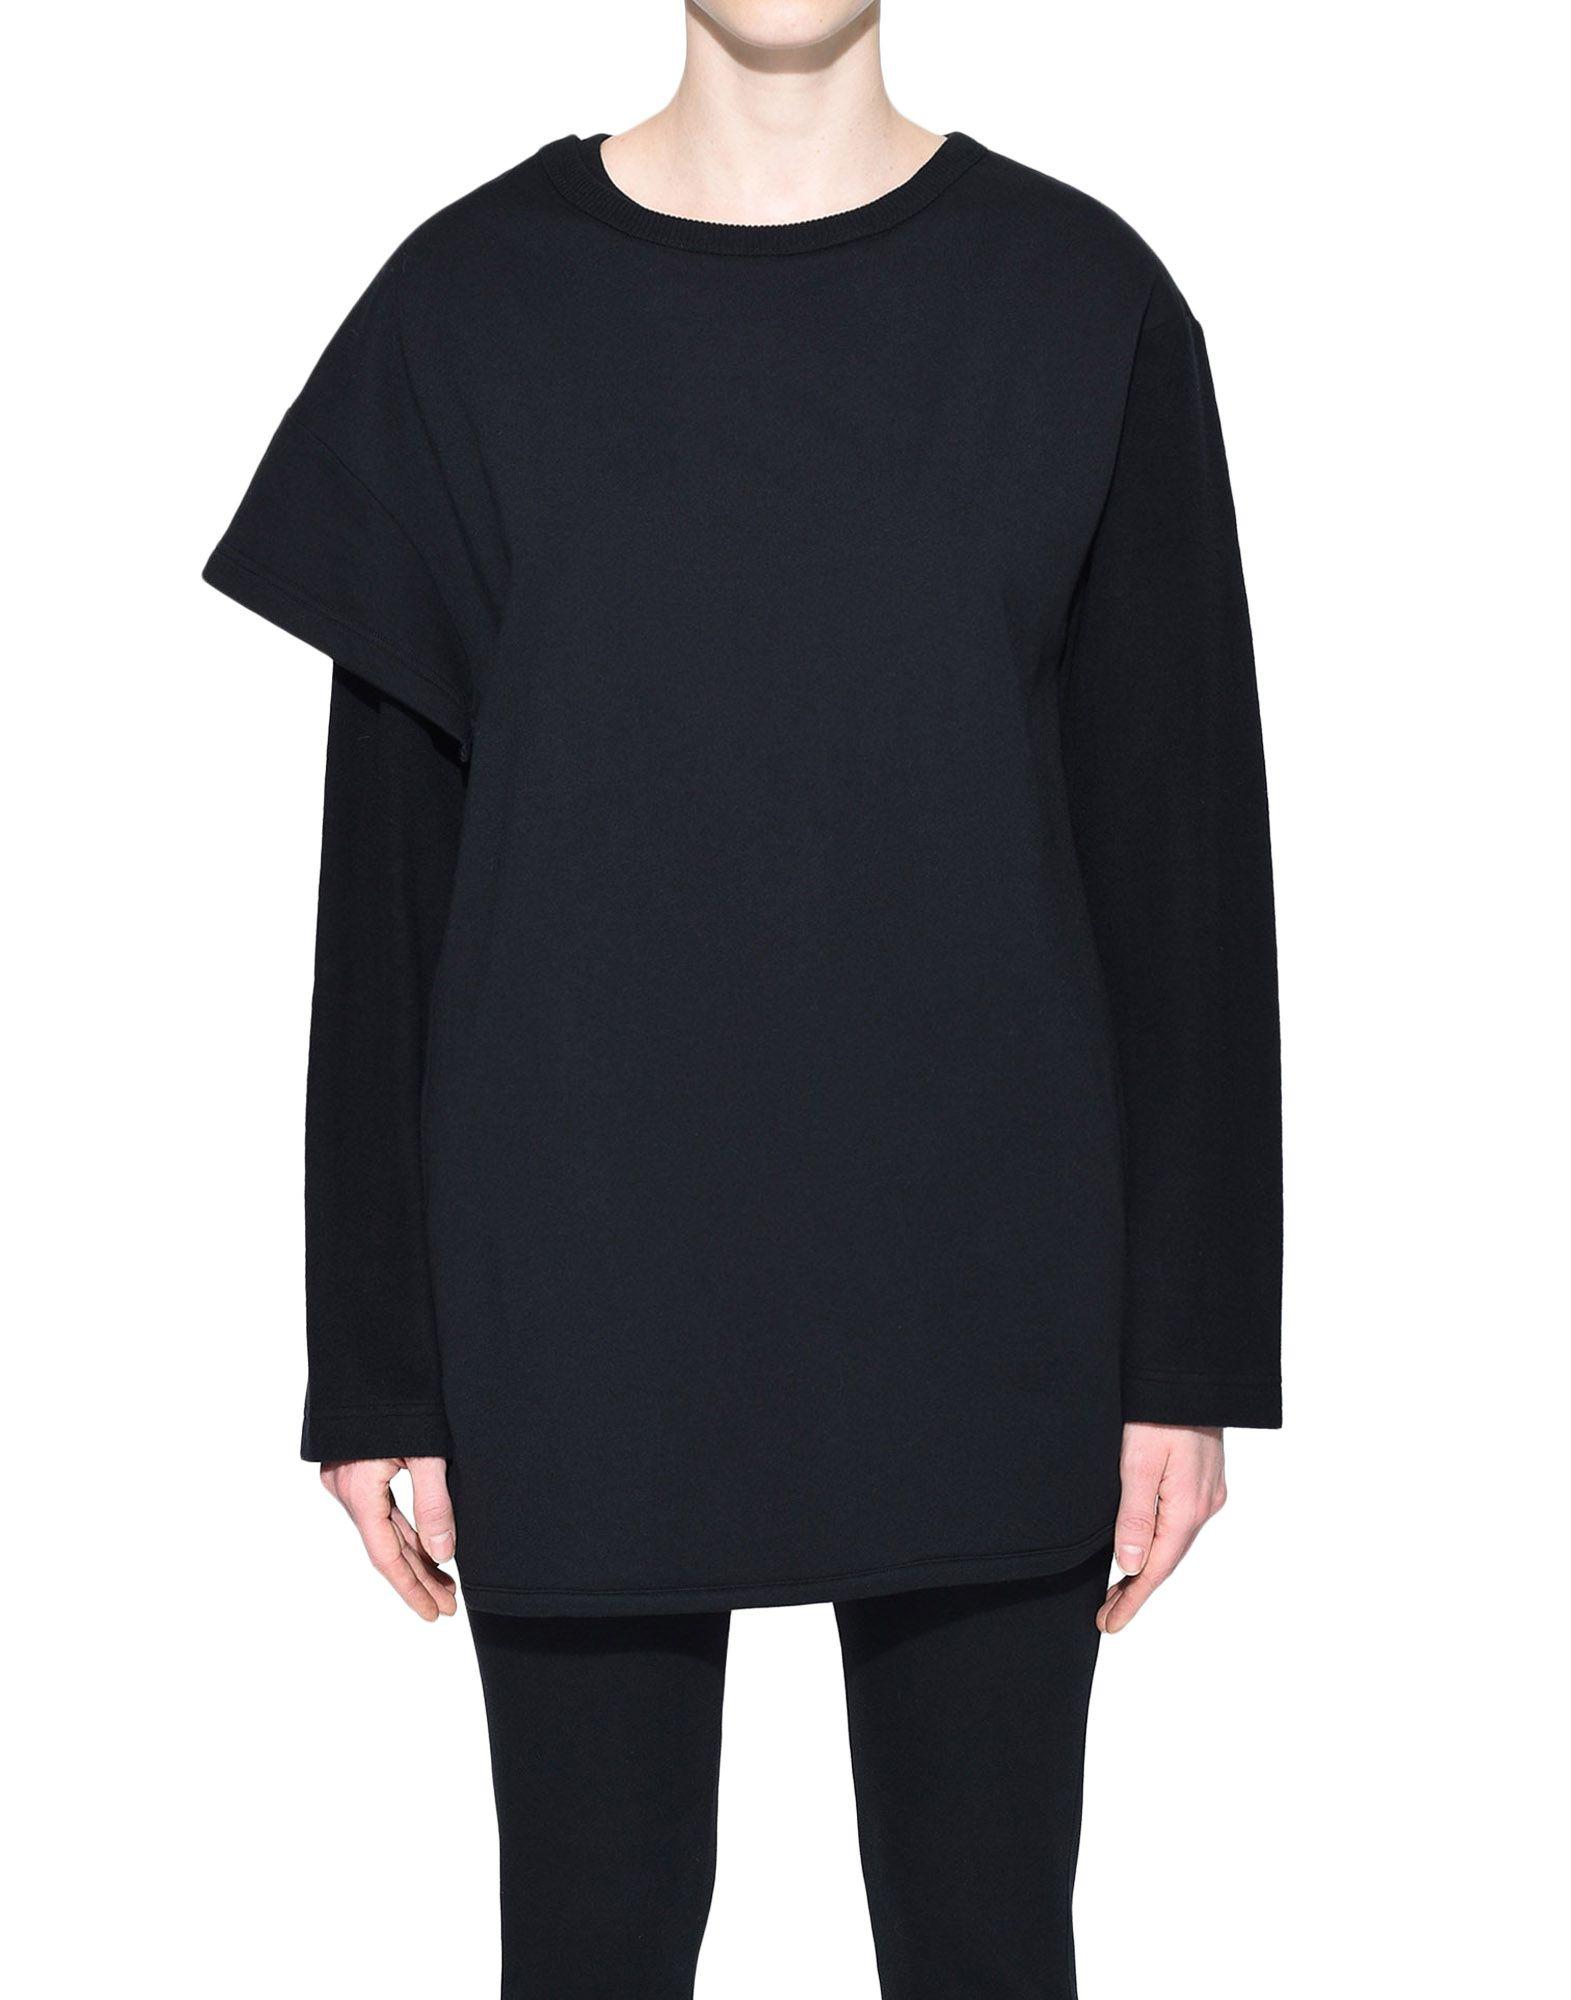 Y-3 Y-3 Two-Layer Fleece Sweater Sweatshirt Woman r